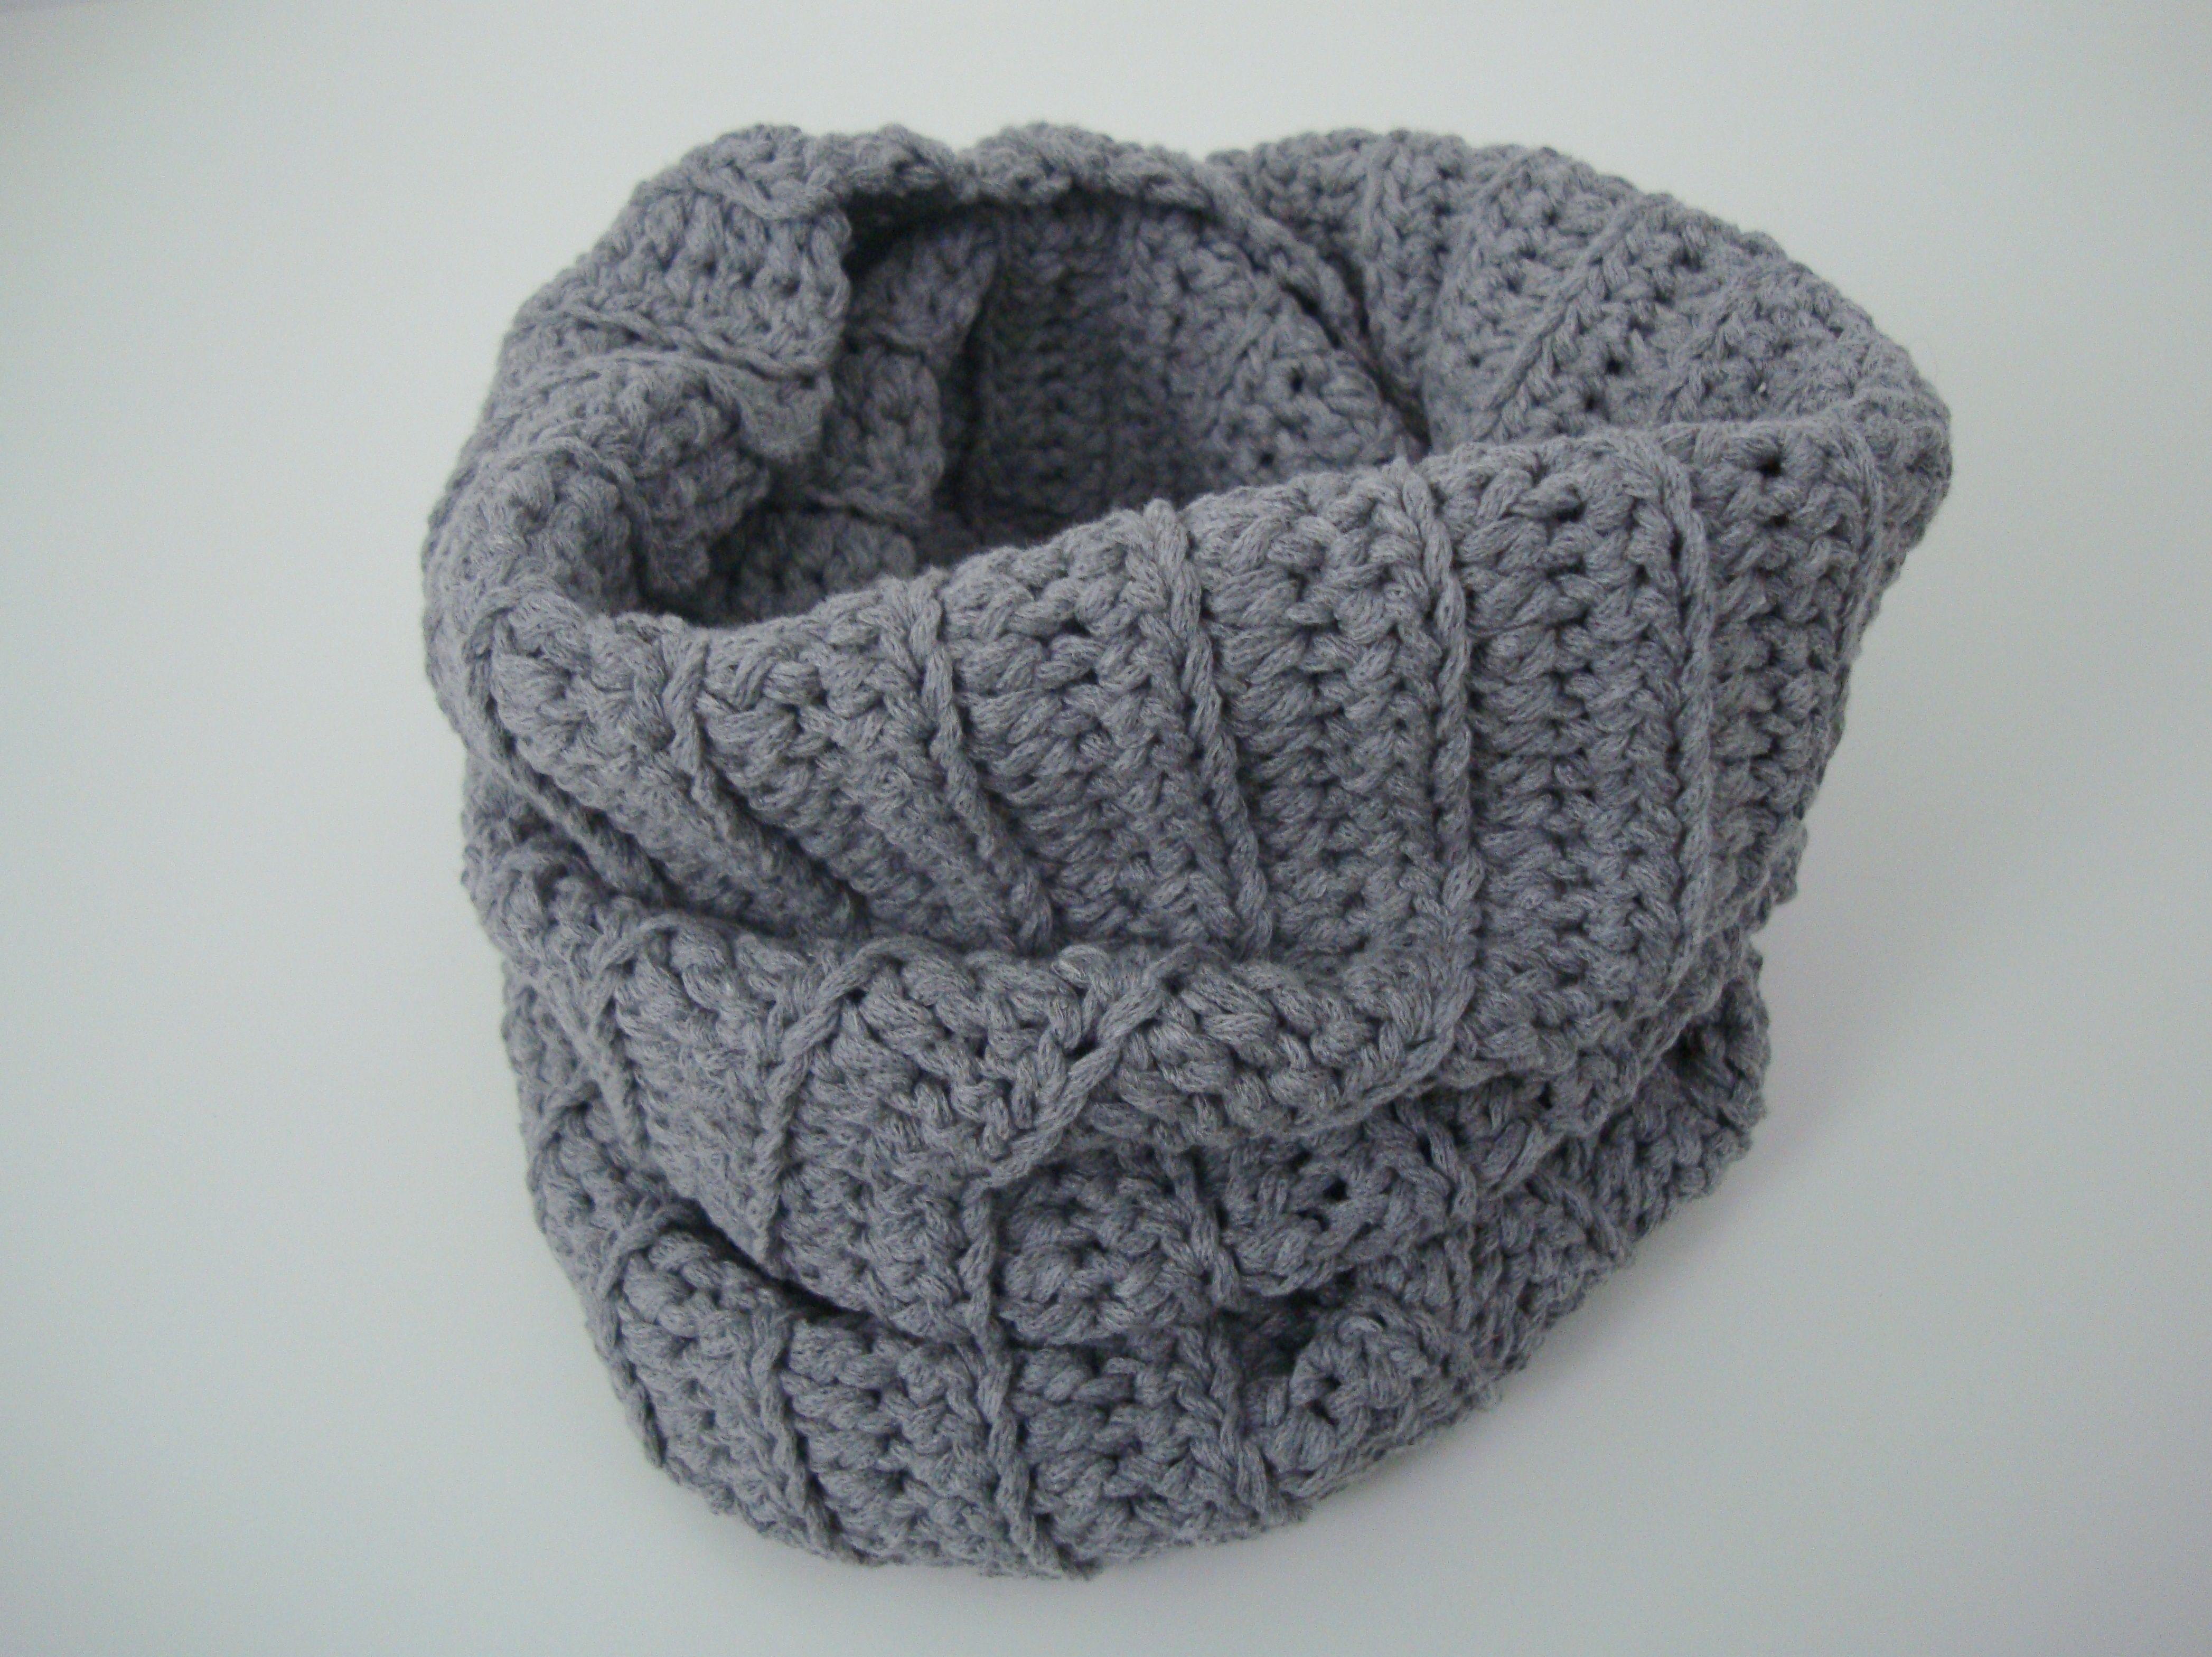 Crochet snood by Hilaria Fina #crochet #snood #handmade www.facebook ...